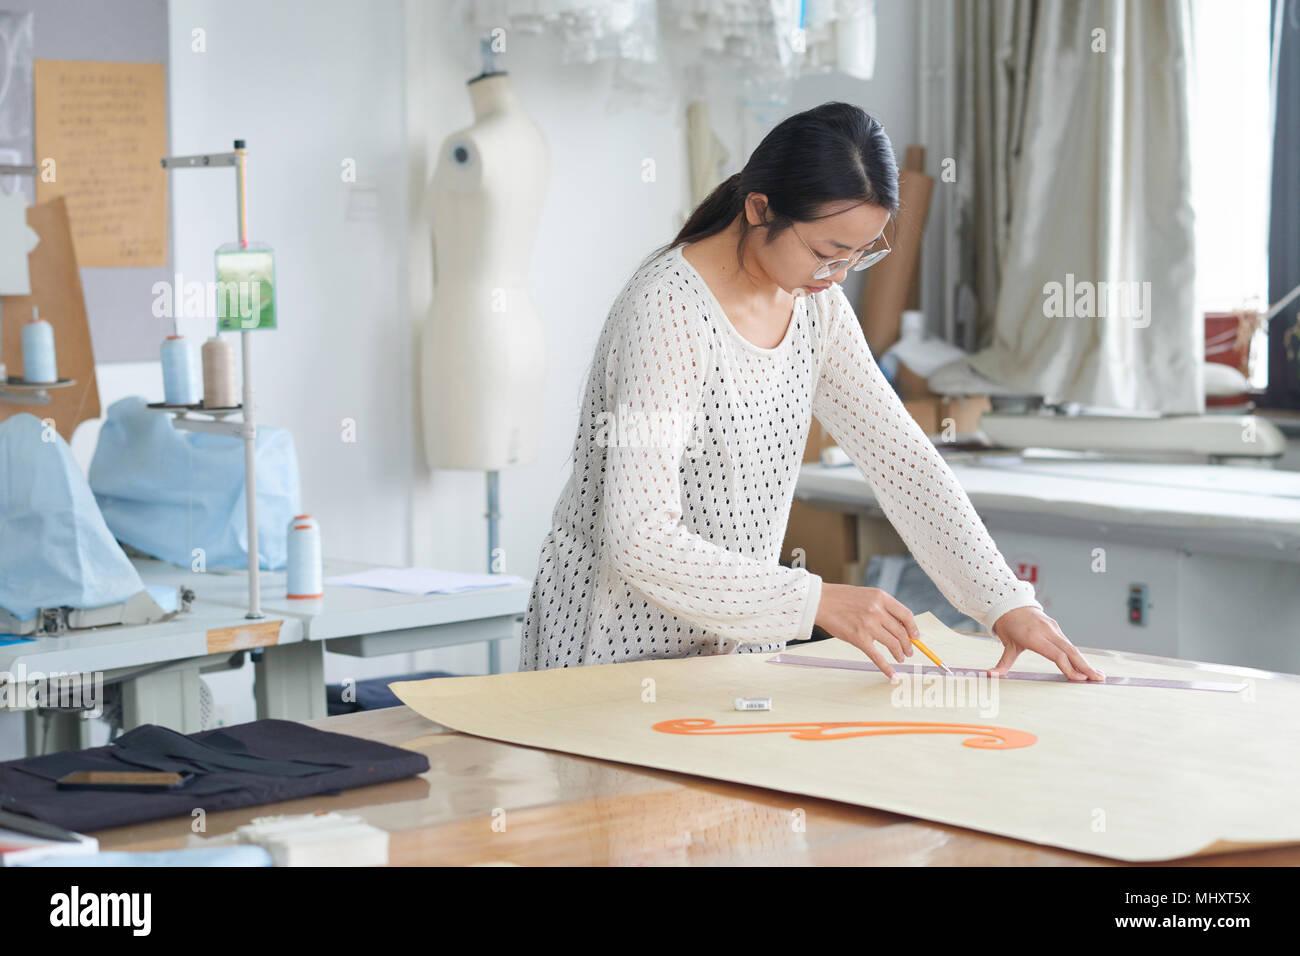 Trainee To Study Fashion Design In The Studio Stock Photo Alamy